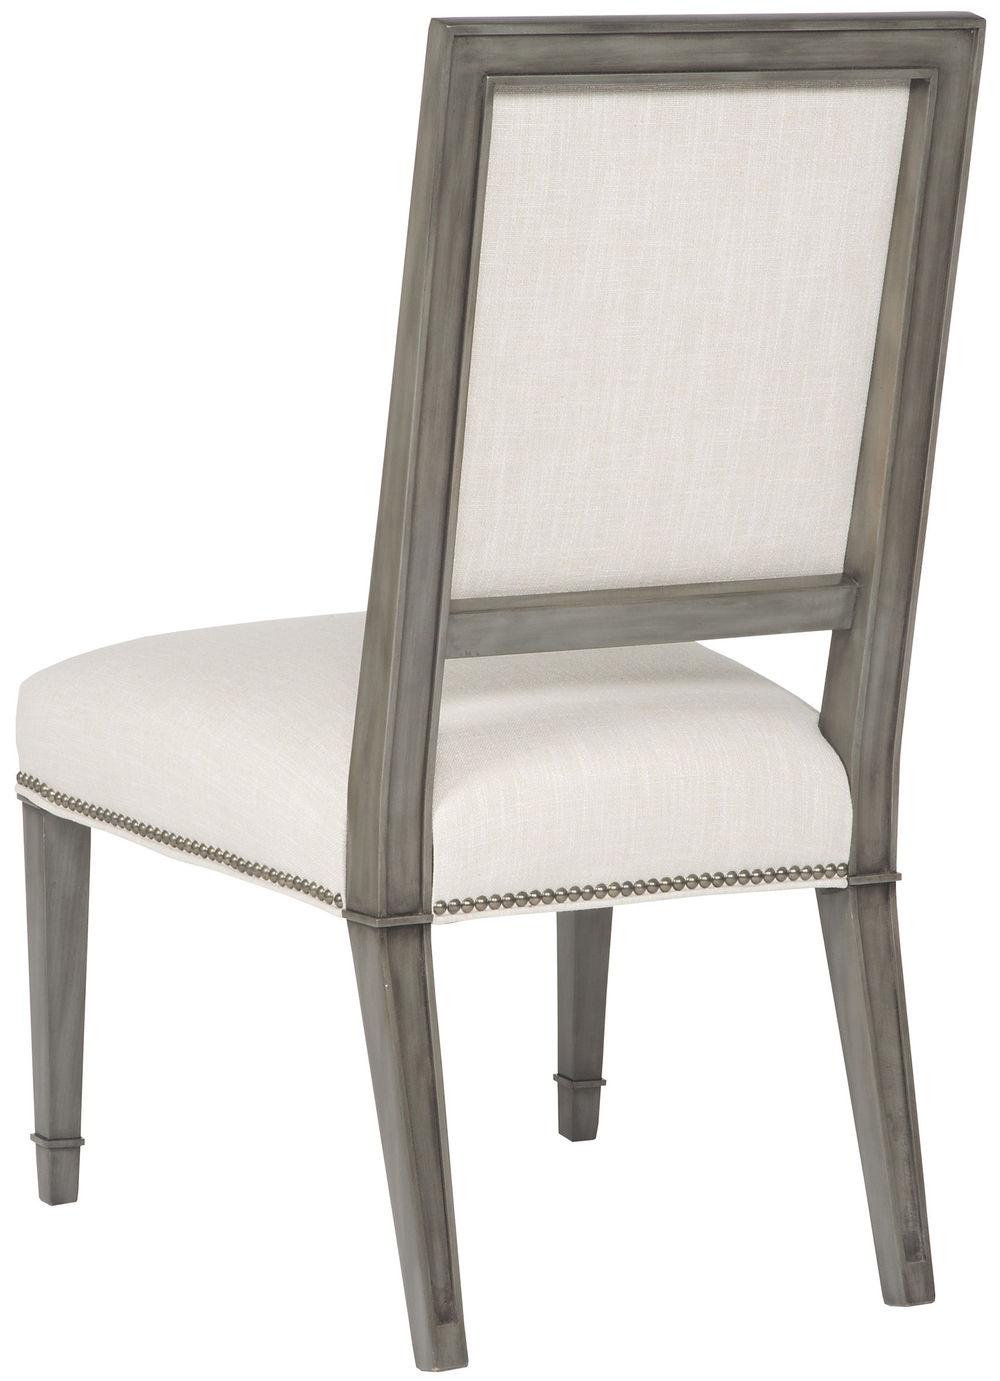 VANGUARD FURNITURE COMPANY - Leighton Side Chair